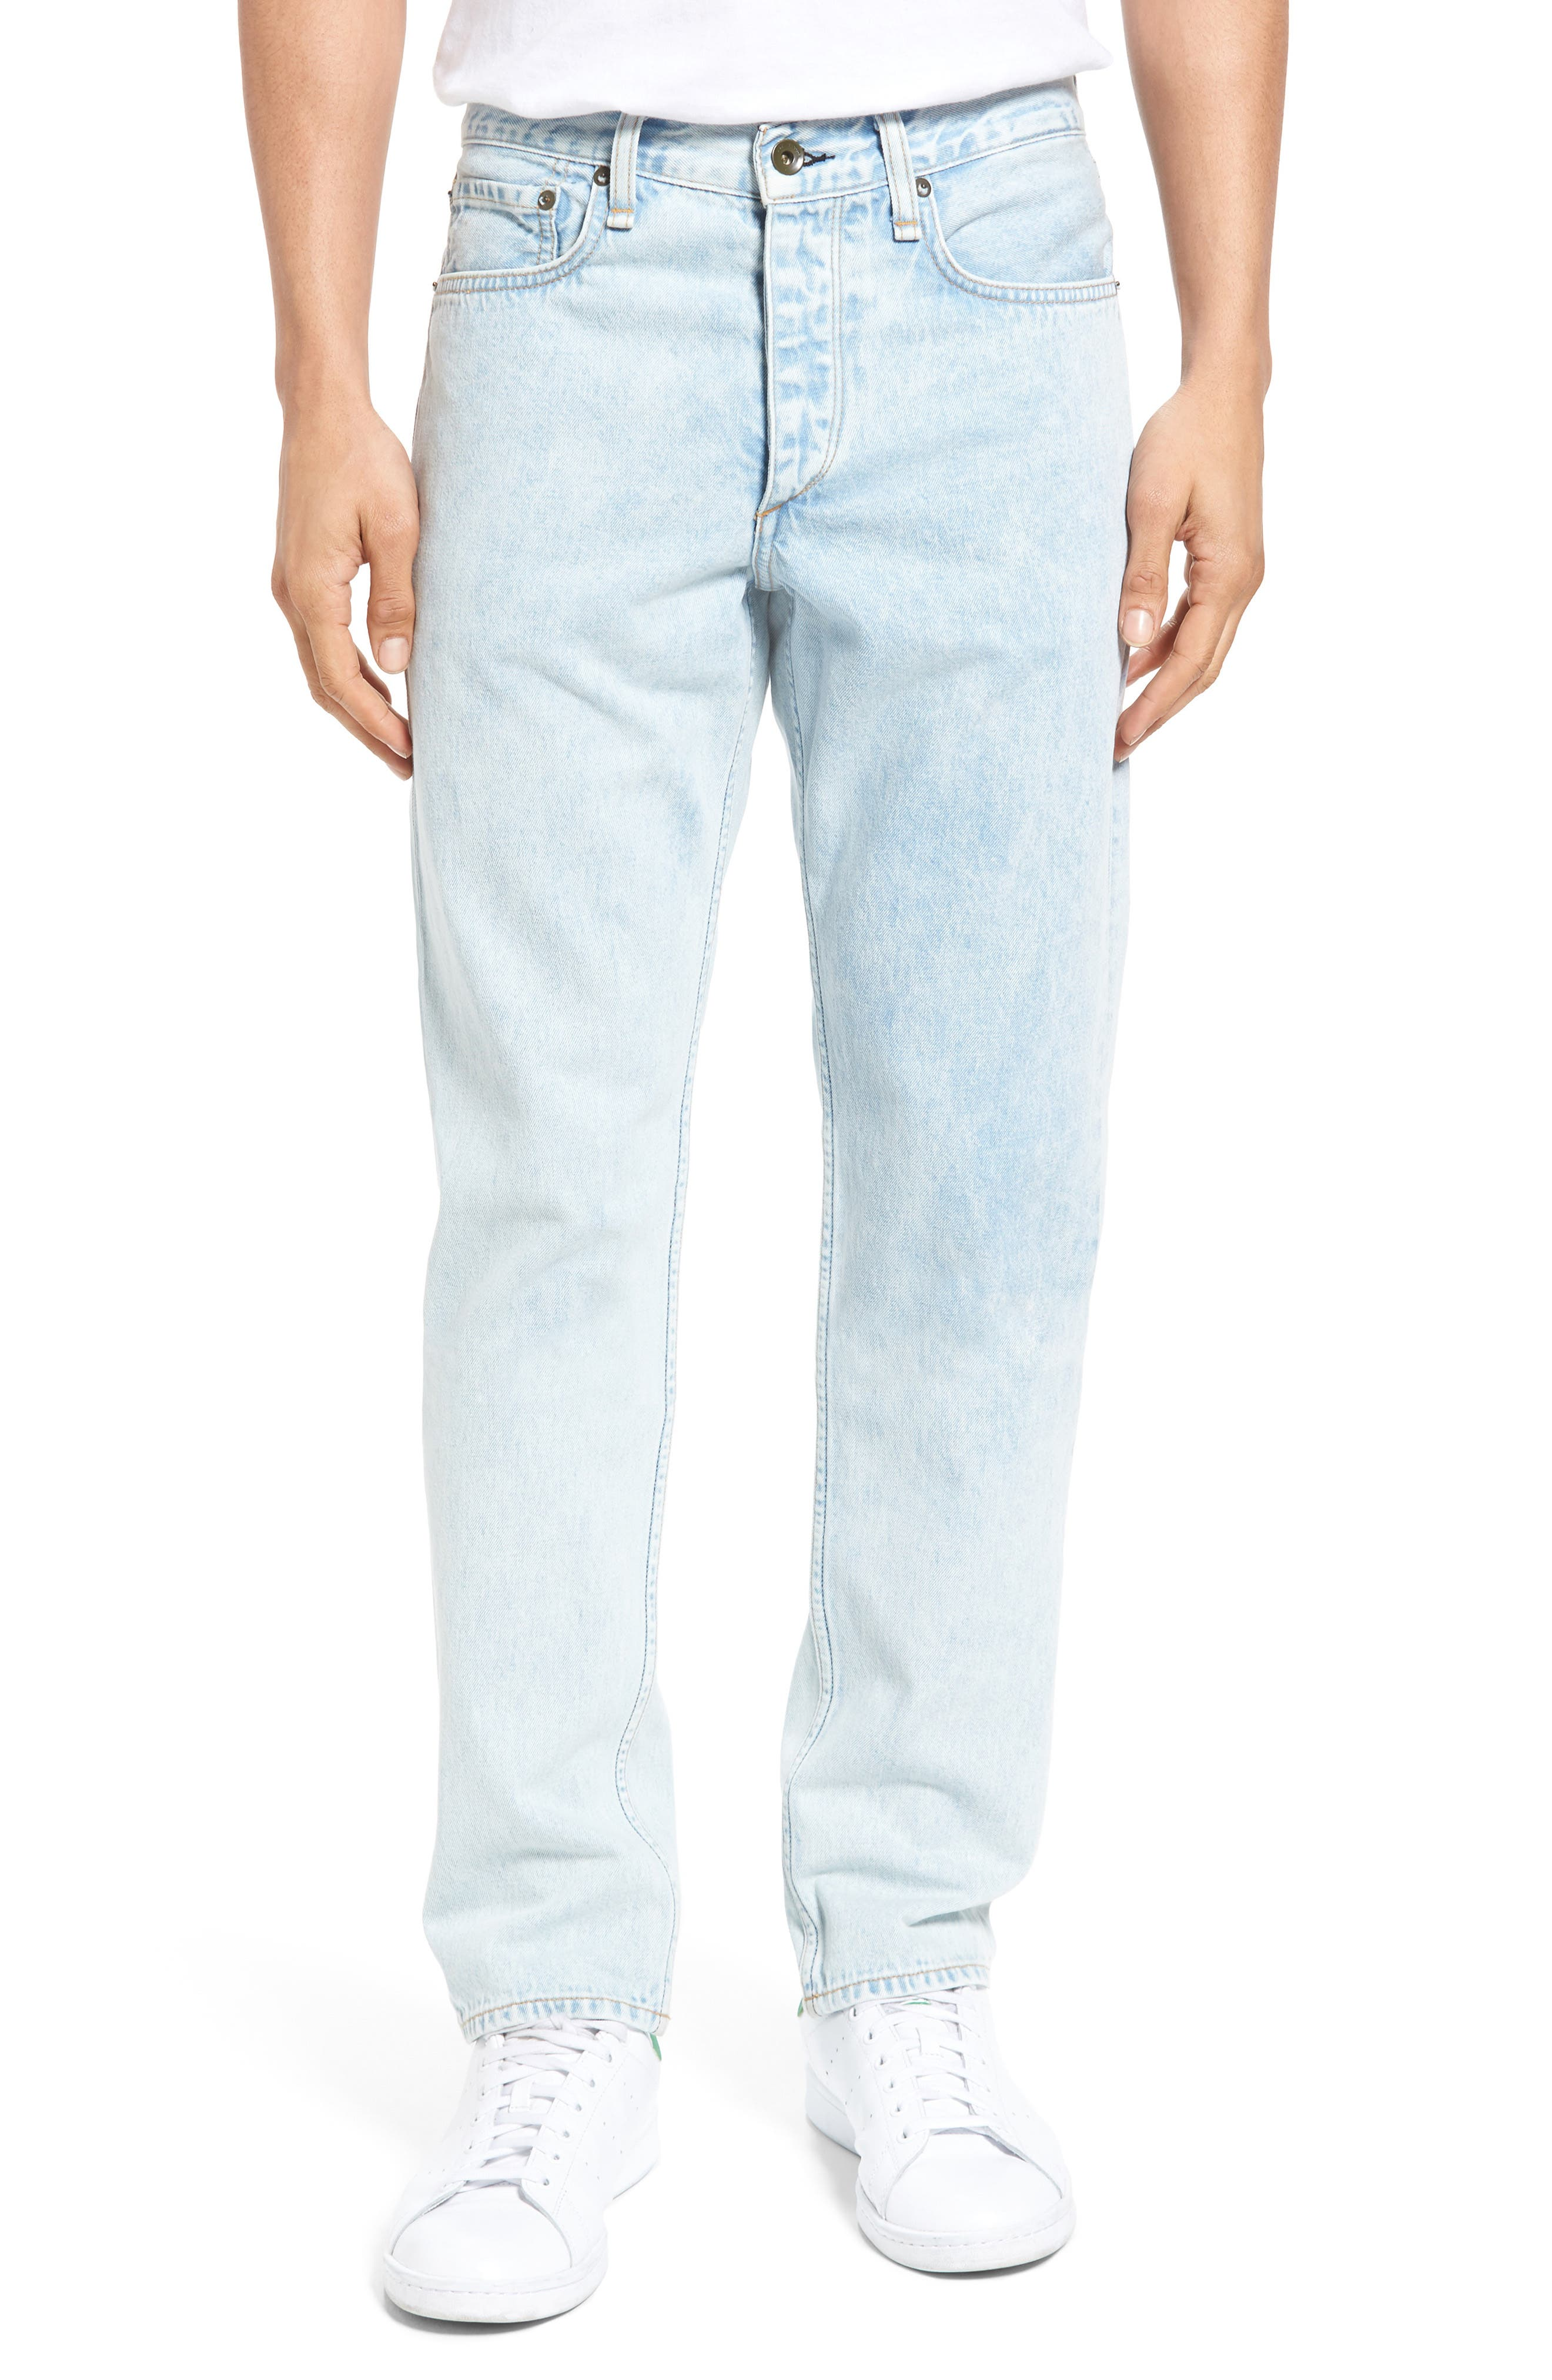 Lennox Skinny Fit Pants,                         Main,                         color, 020